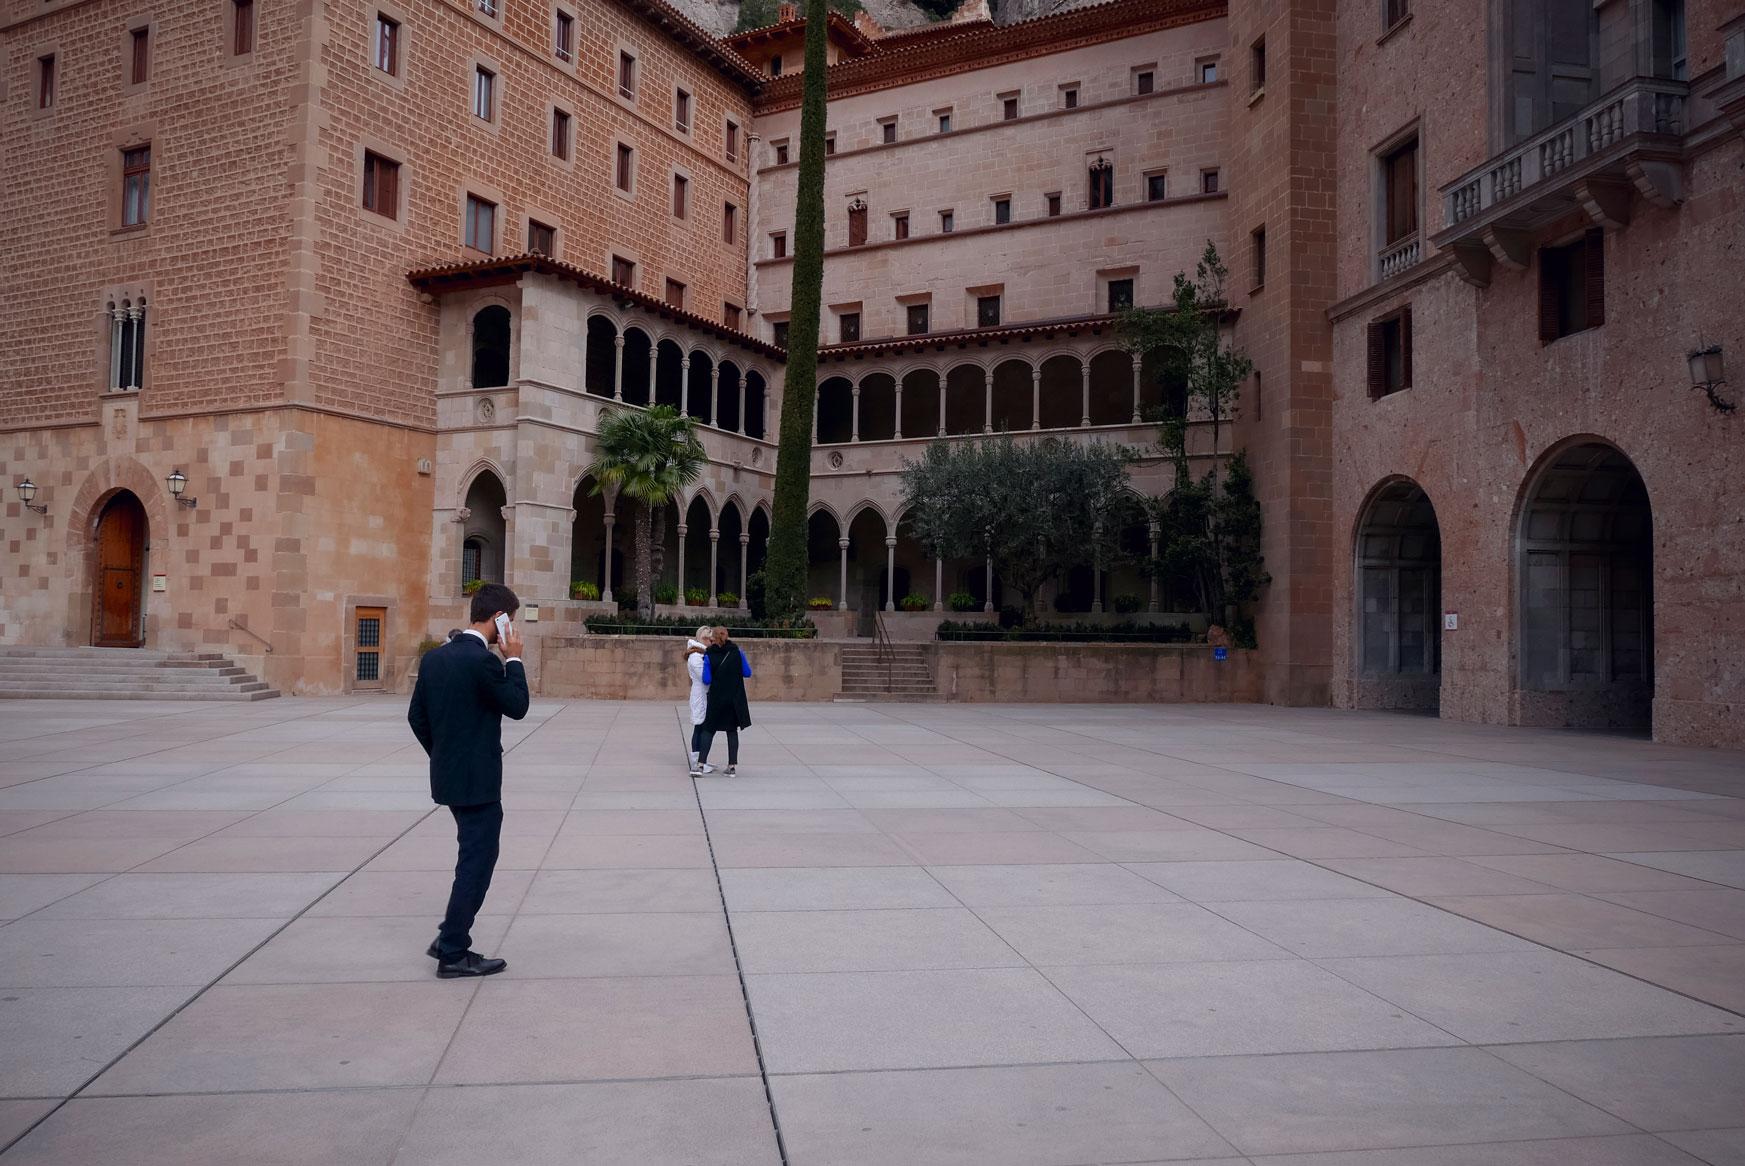 Spain Barcelona Montserrat Monastery main square8